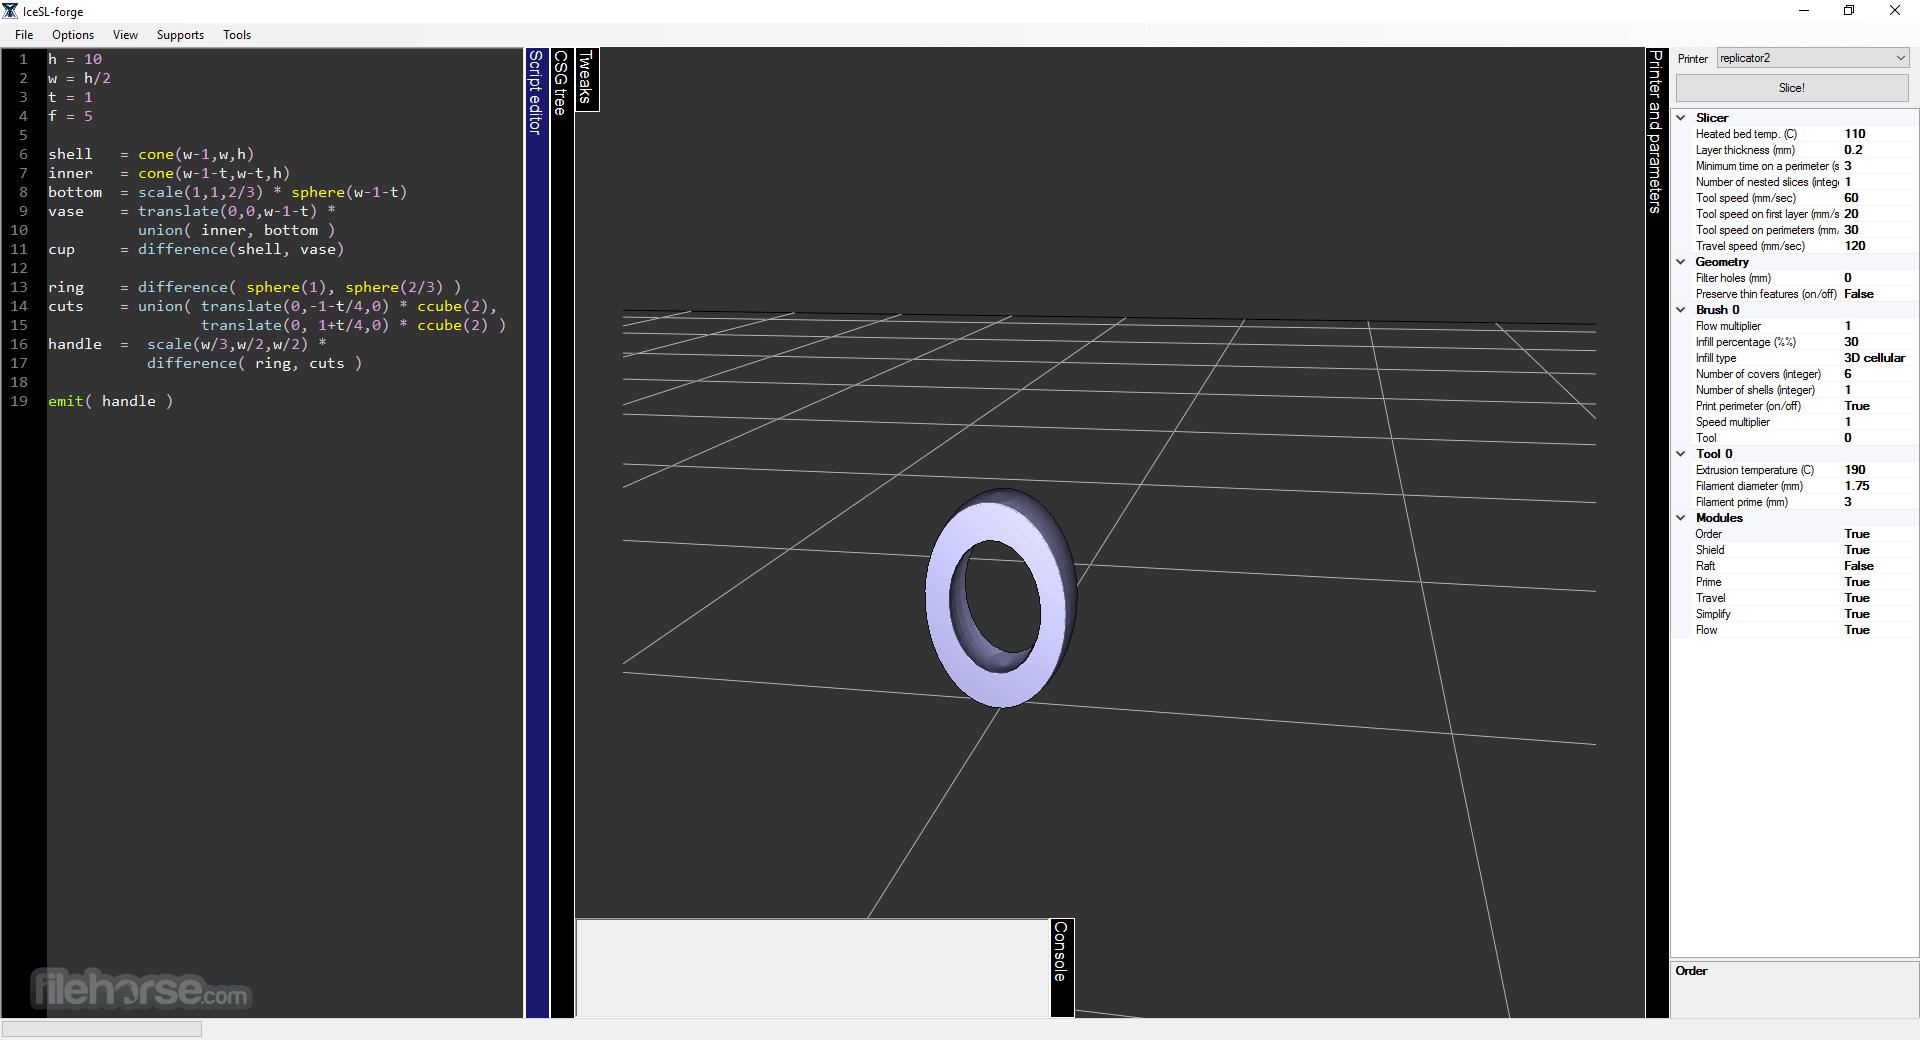 IceSL 2.3.5 (32-bit) Captura de Pantalla 4